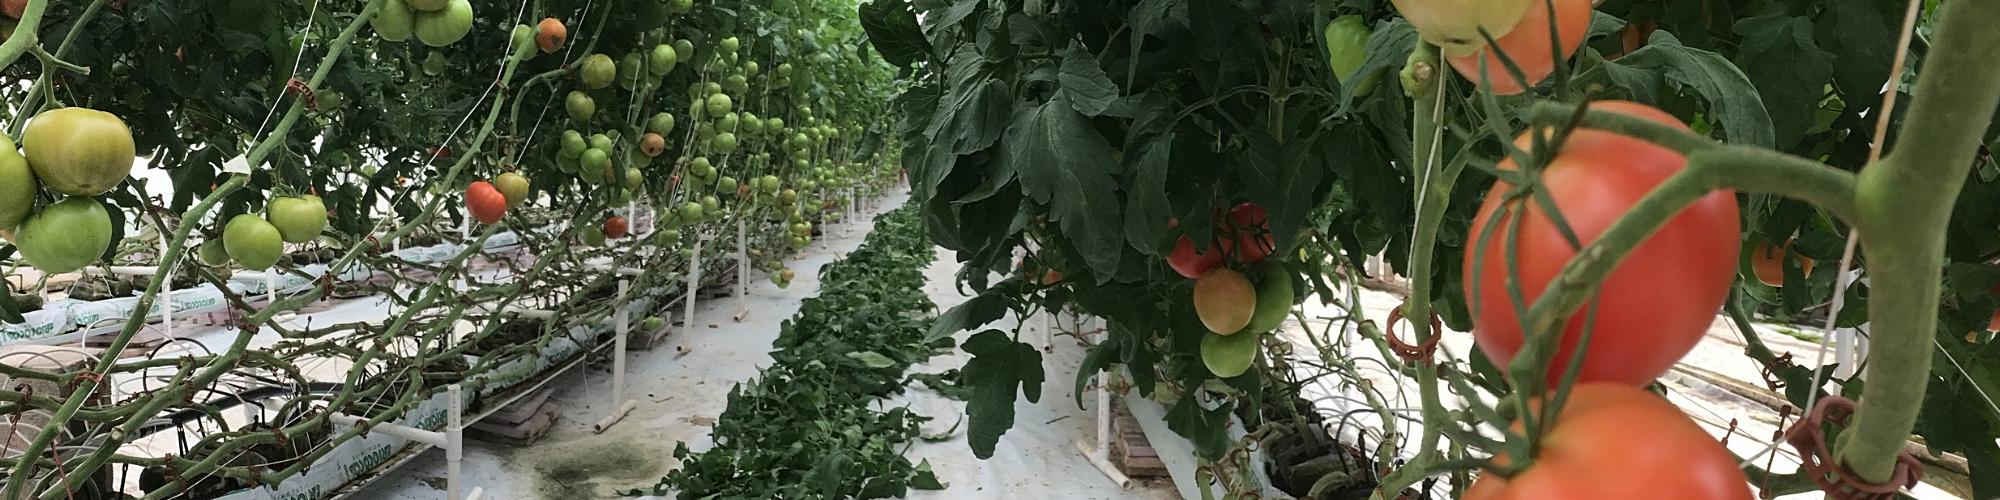 Tomato greenhouse.JPG